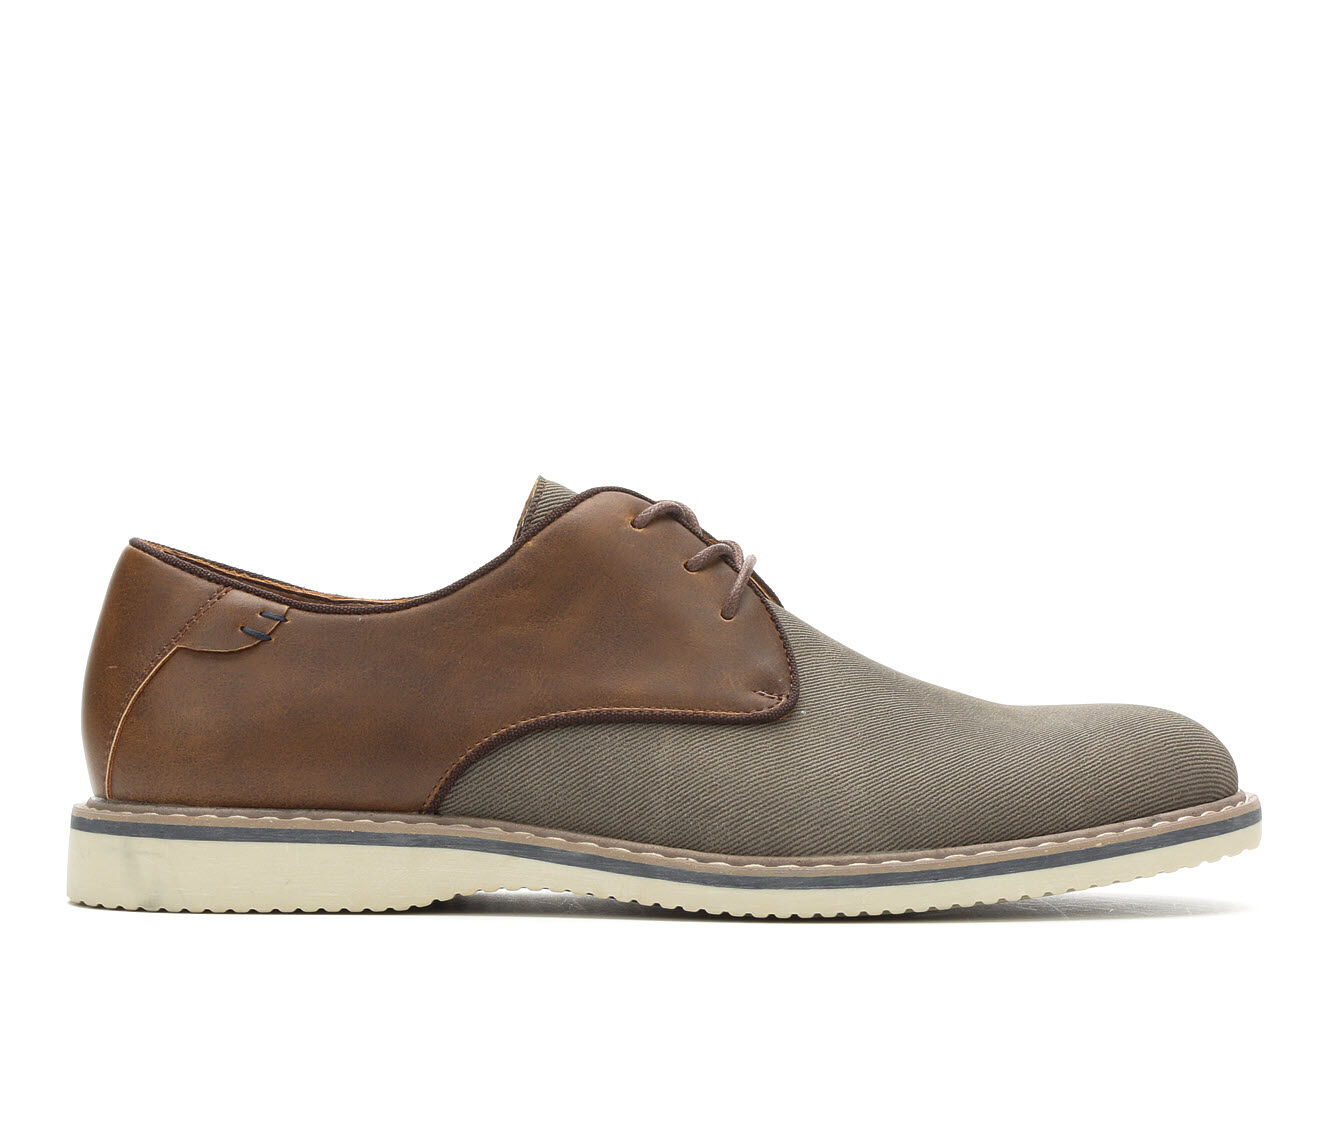 uk shoes_kd1311